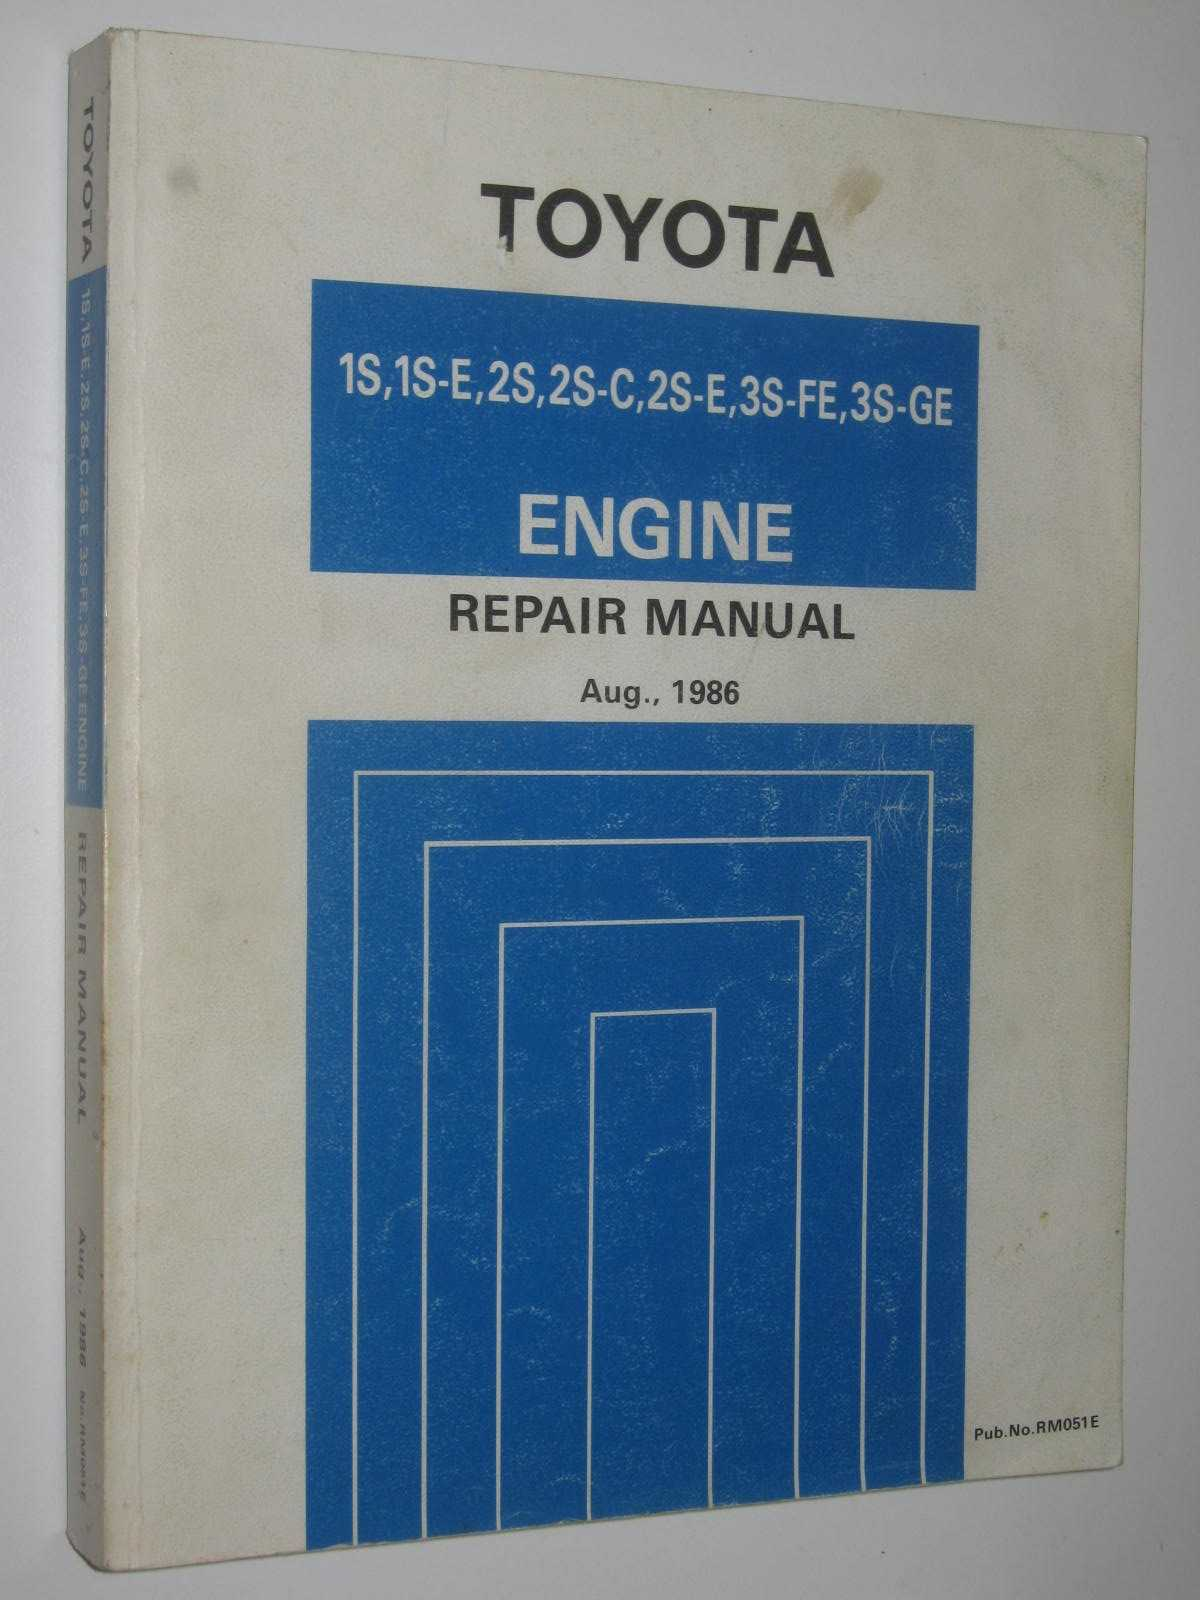 Image for Toyota 1S, 1S-E, 2S, 2S-C, 2S-E, 3S-FE, 3S-GE Engine Repair Manual : Publication number RM051E